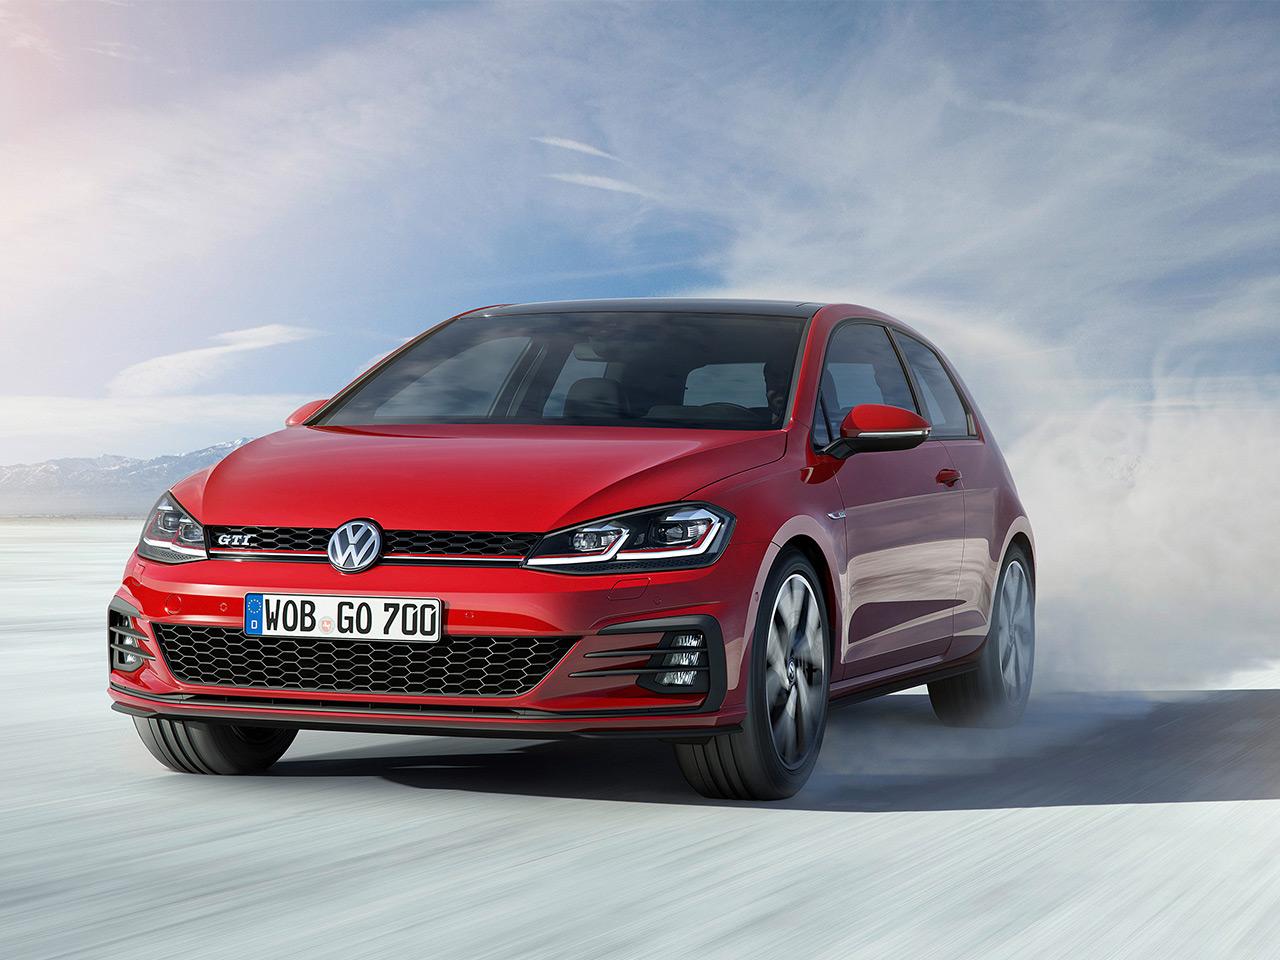 Golf 7 Preis >> Vw Golf 7 Gti Facelift 2017 Preis Motor Autozeitung De